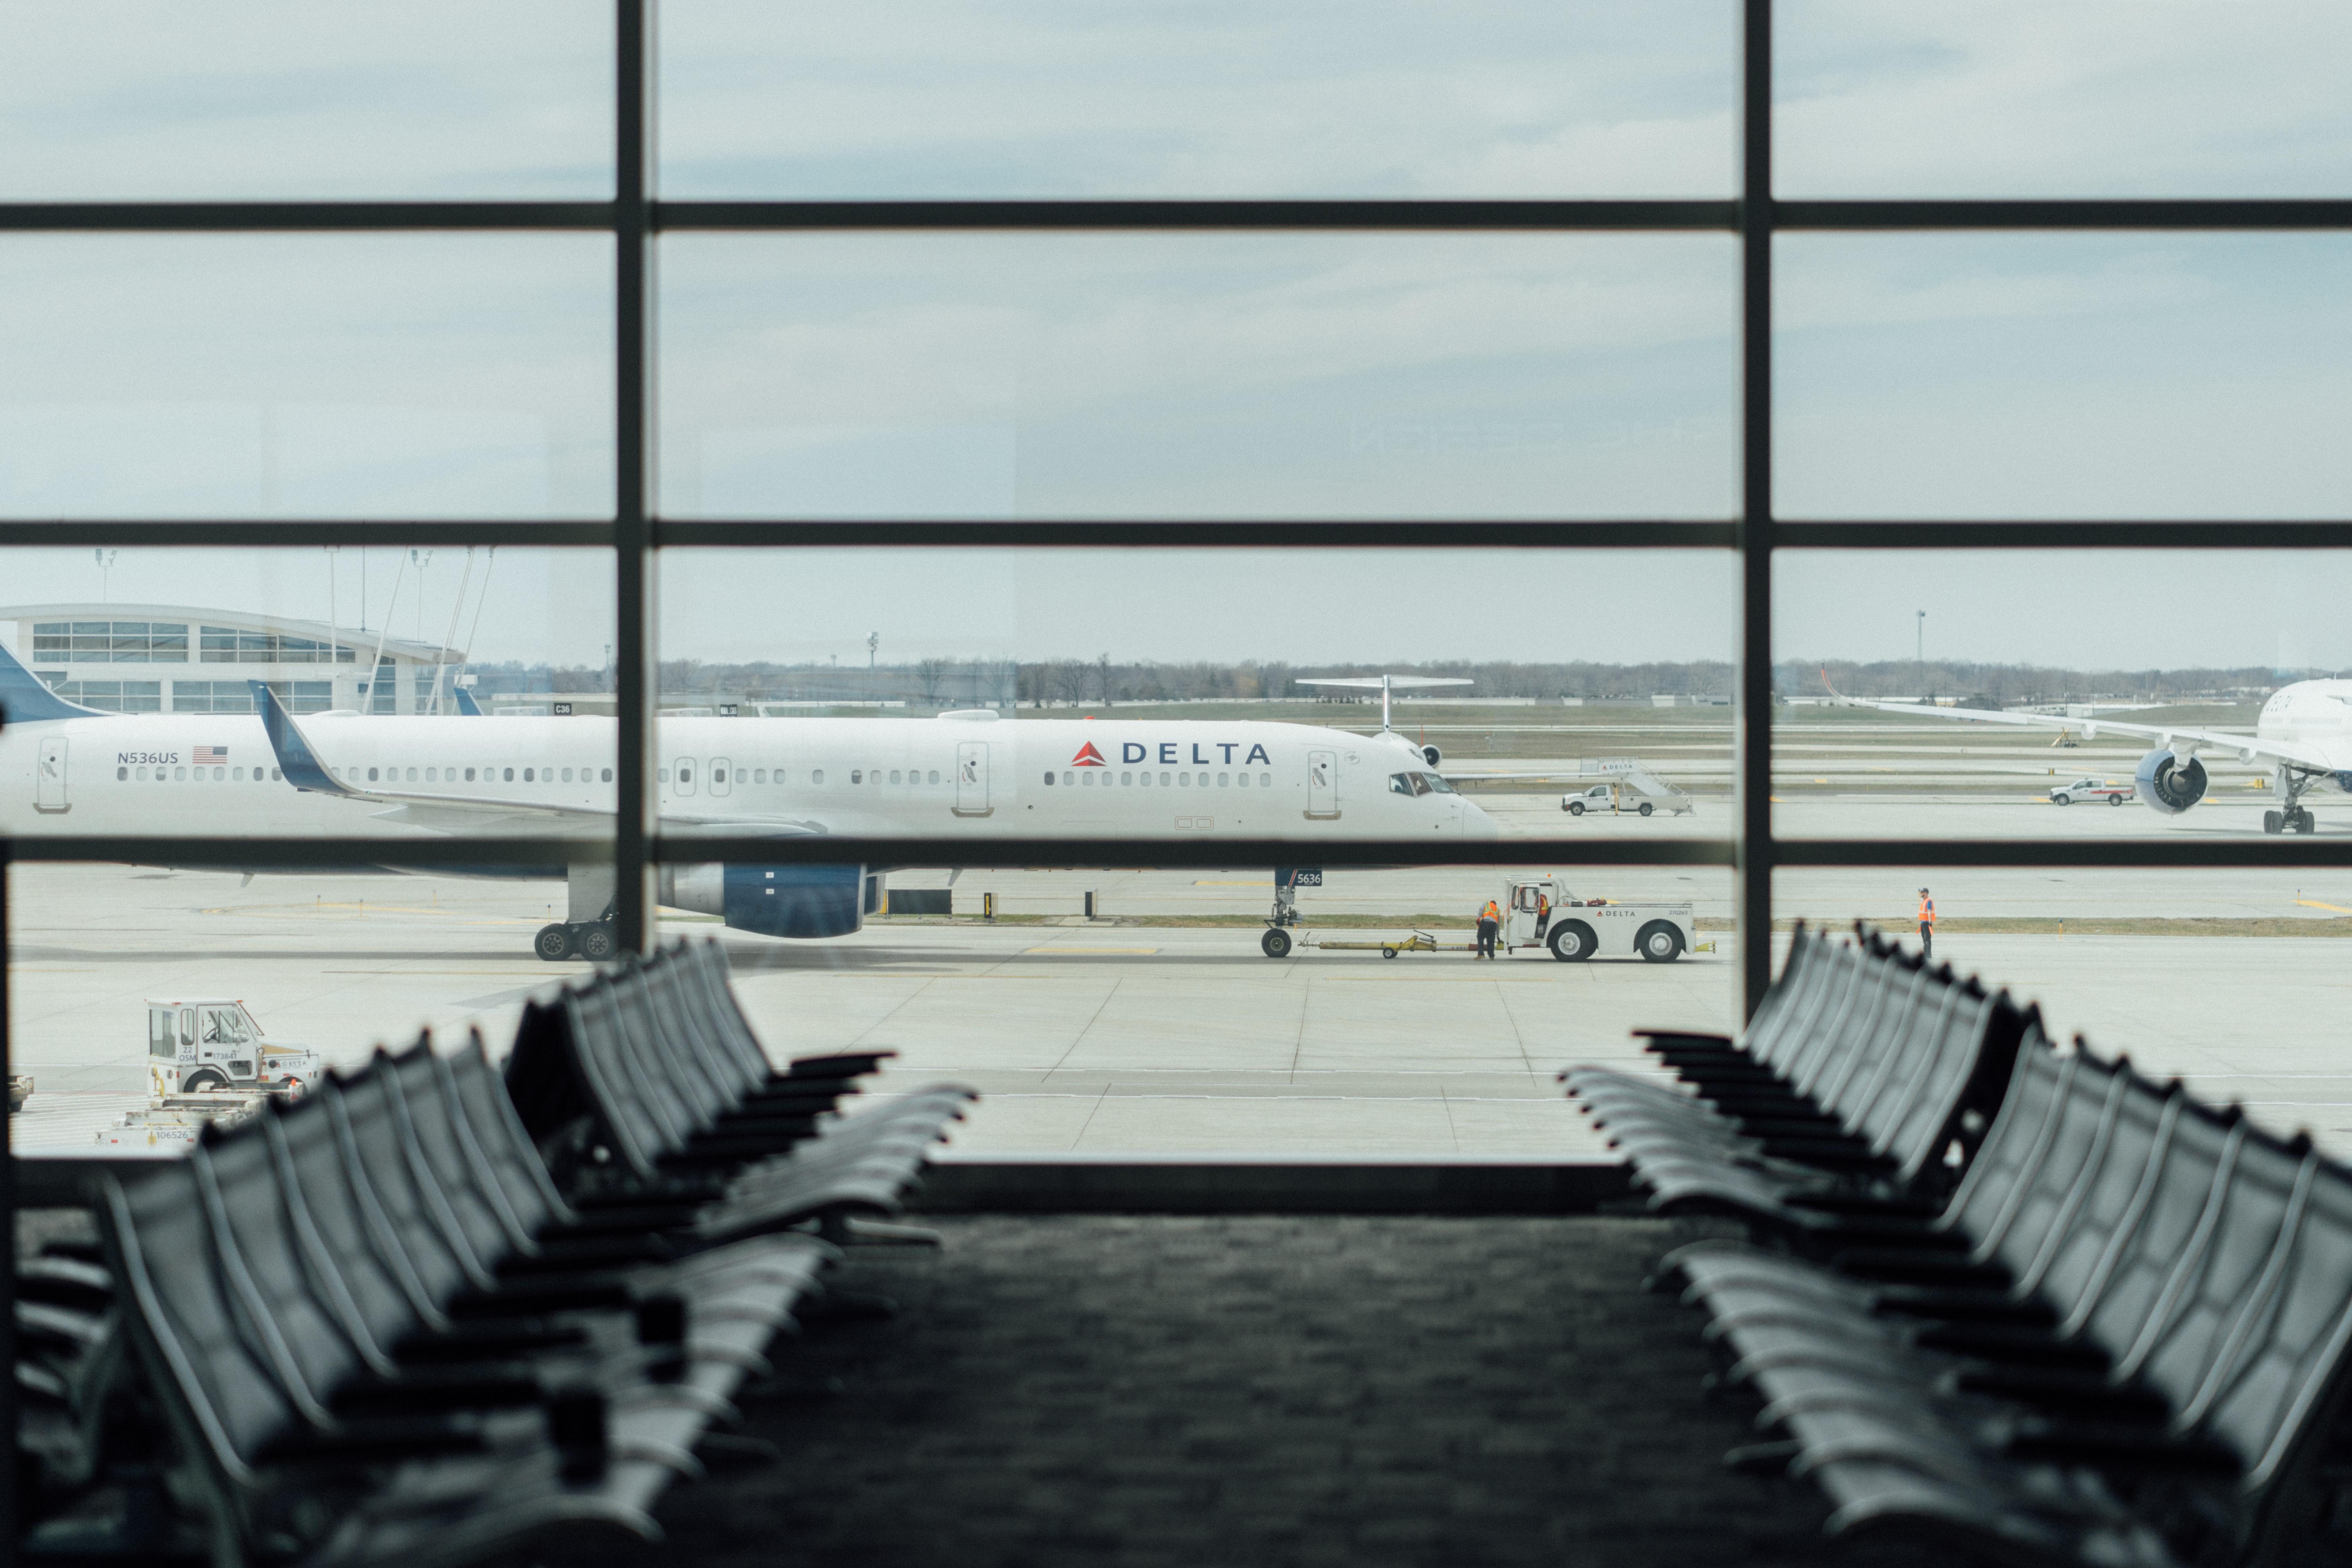 Delta airlines icon